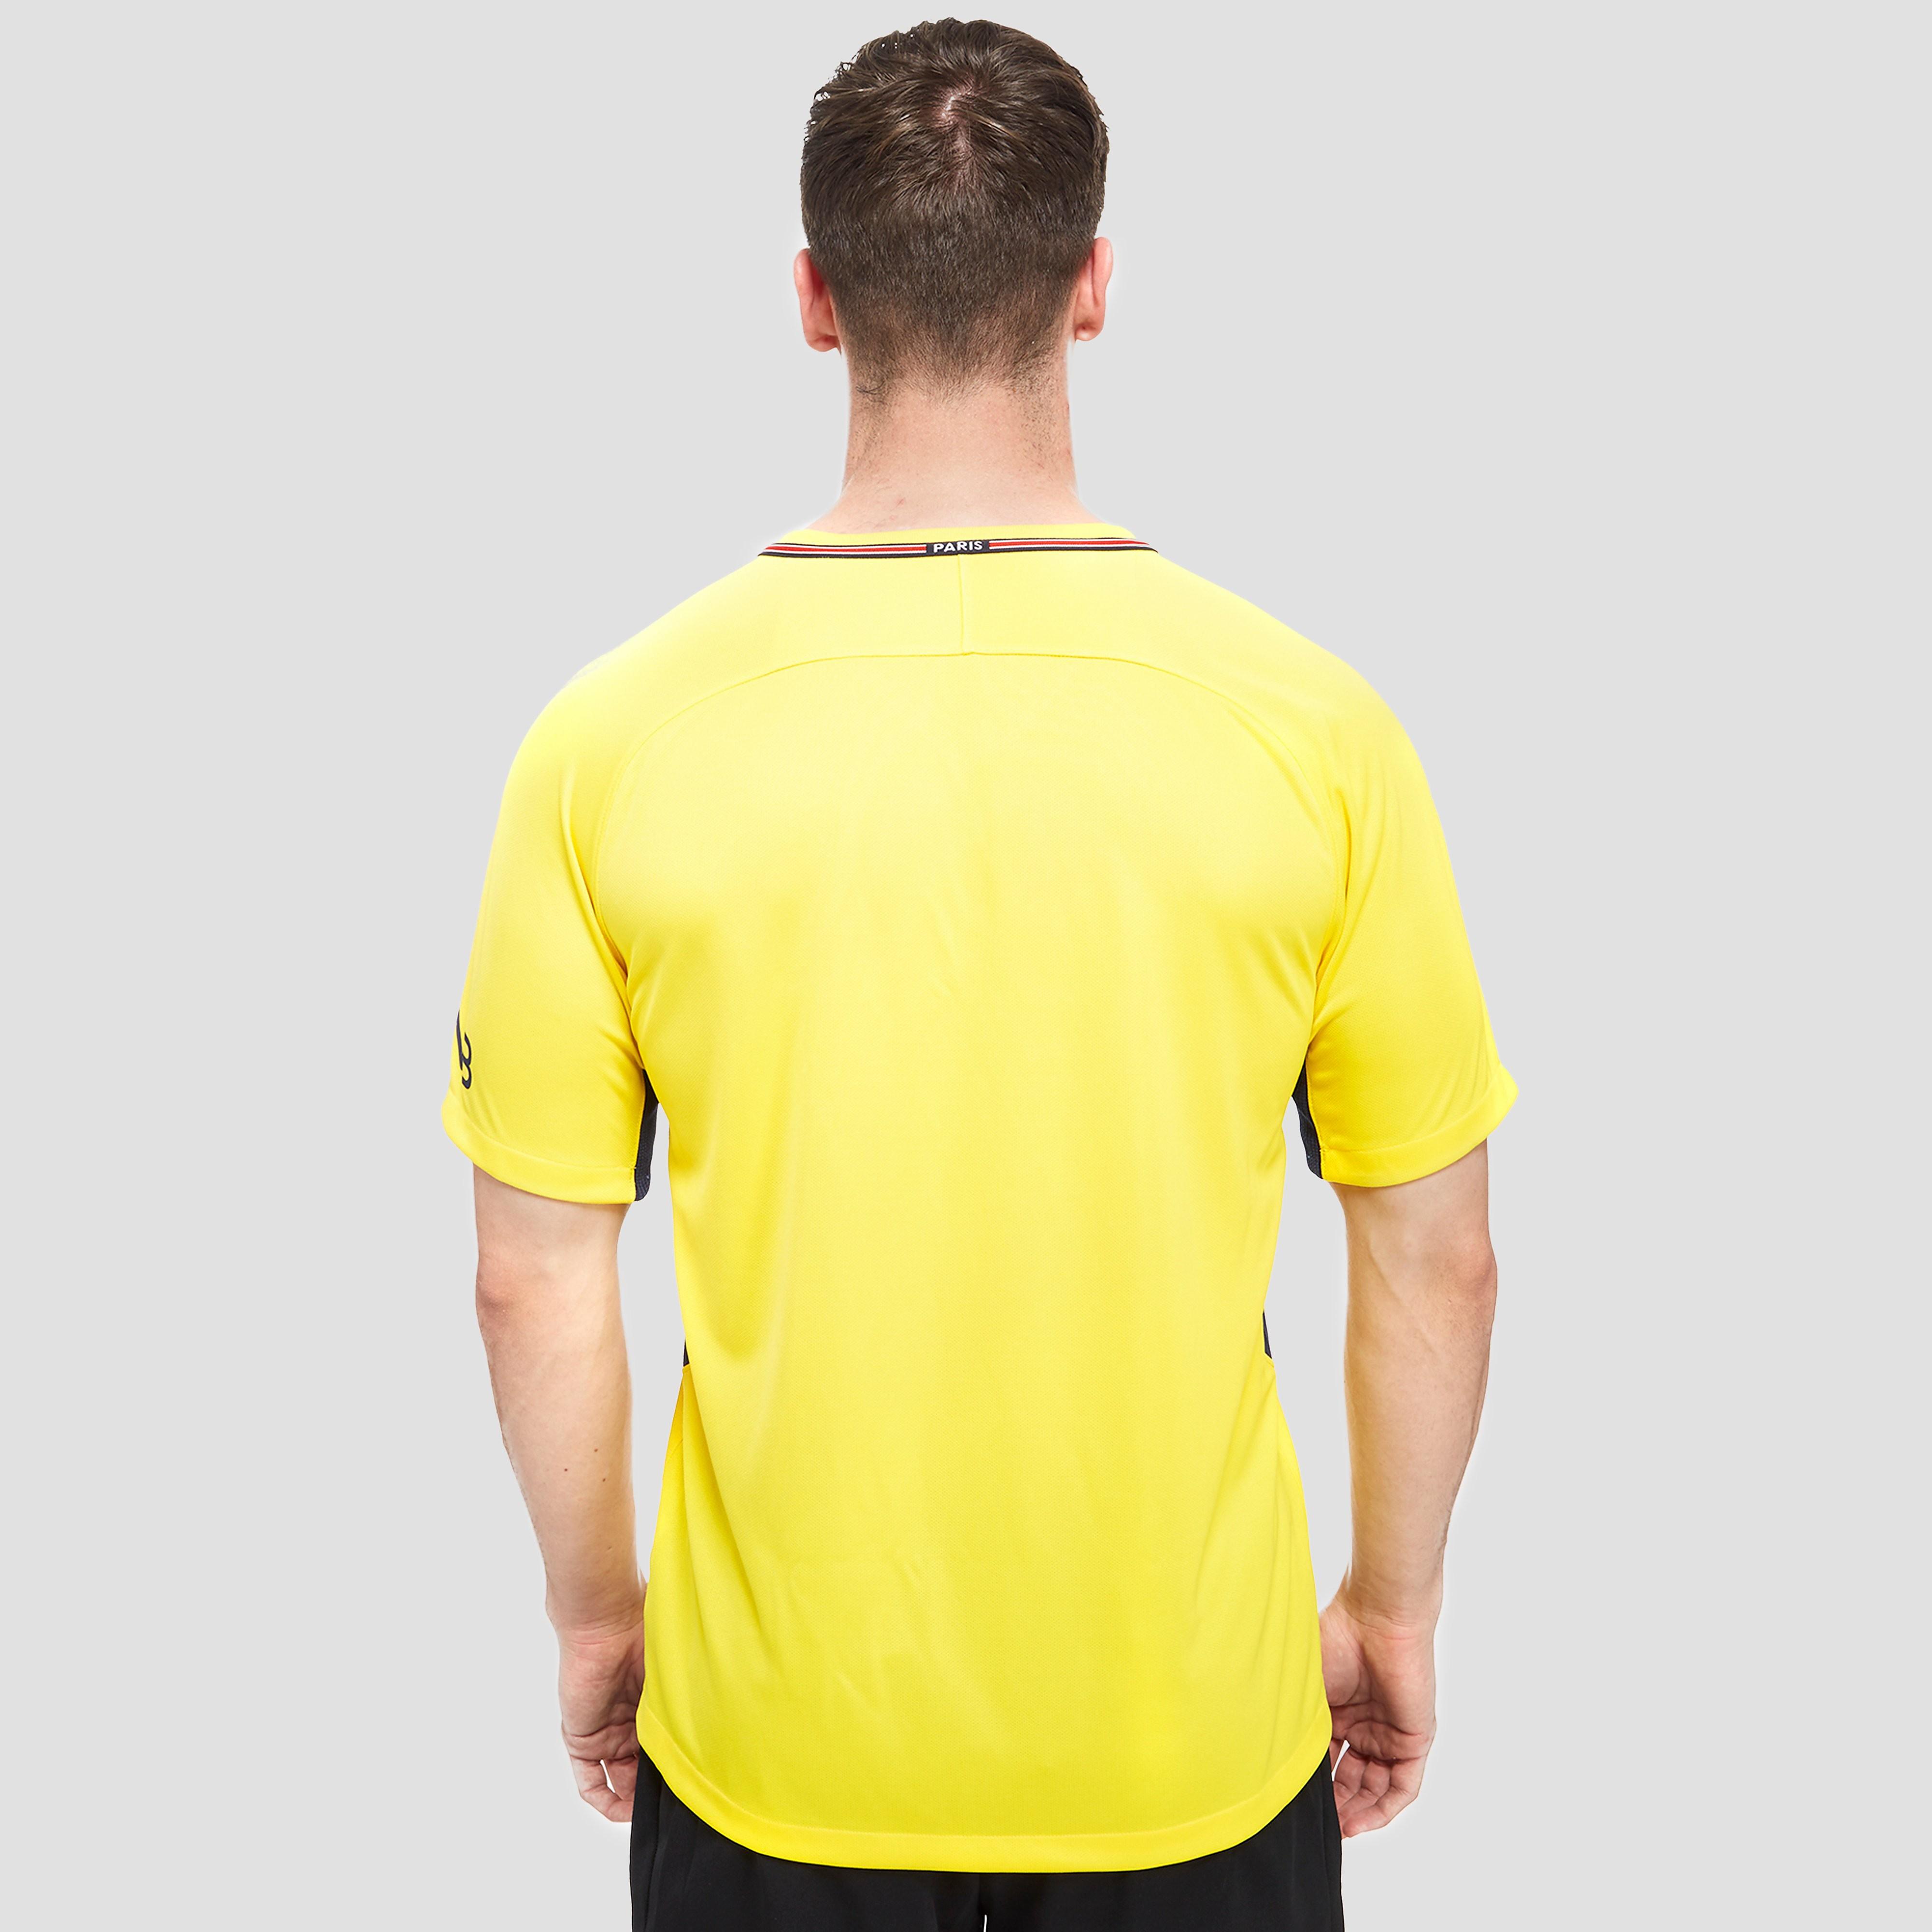 Nike Paris Saint Germain 2017/18 Away Shirt